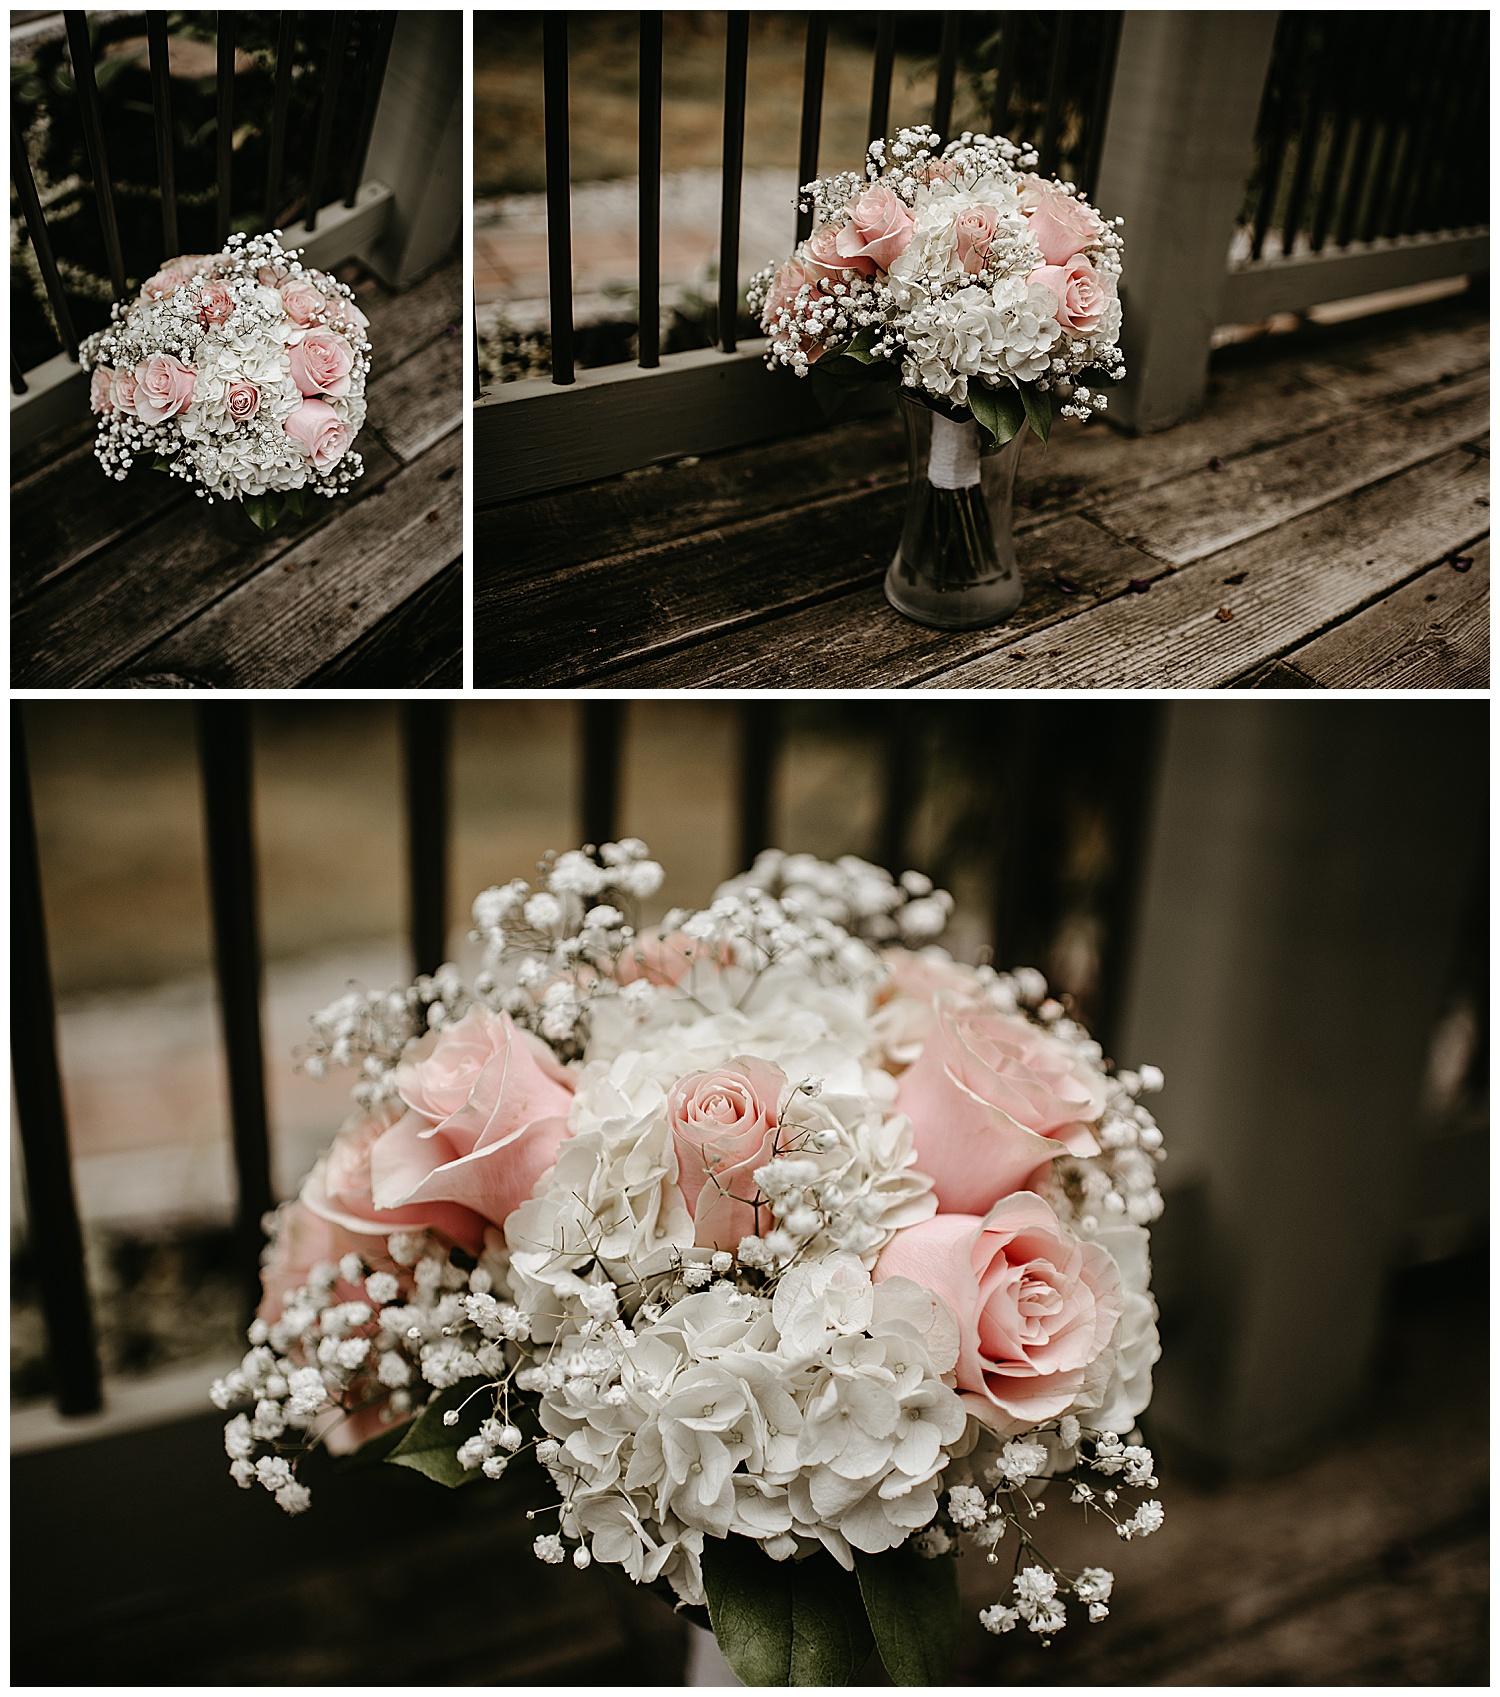 NEPA-Mount-Pocono-Wedding-Photographer-at-the-Stroudsmoor-Country-Inn-Stroudsburg-PA_0003.jpg